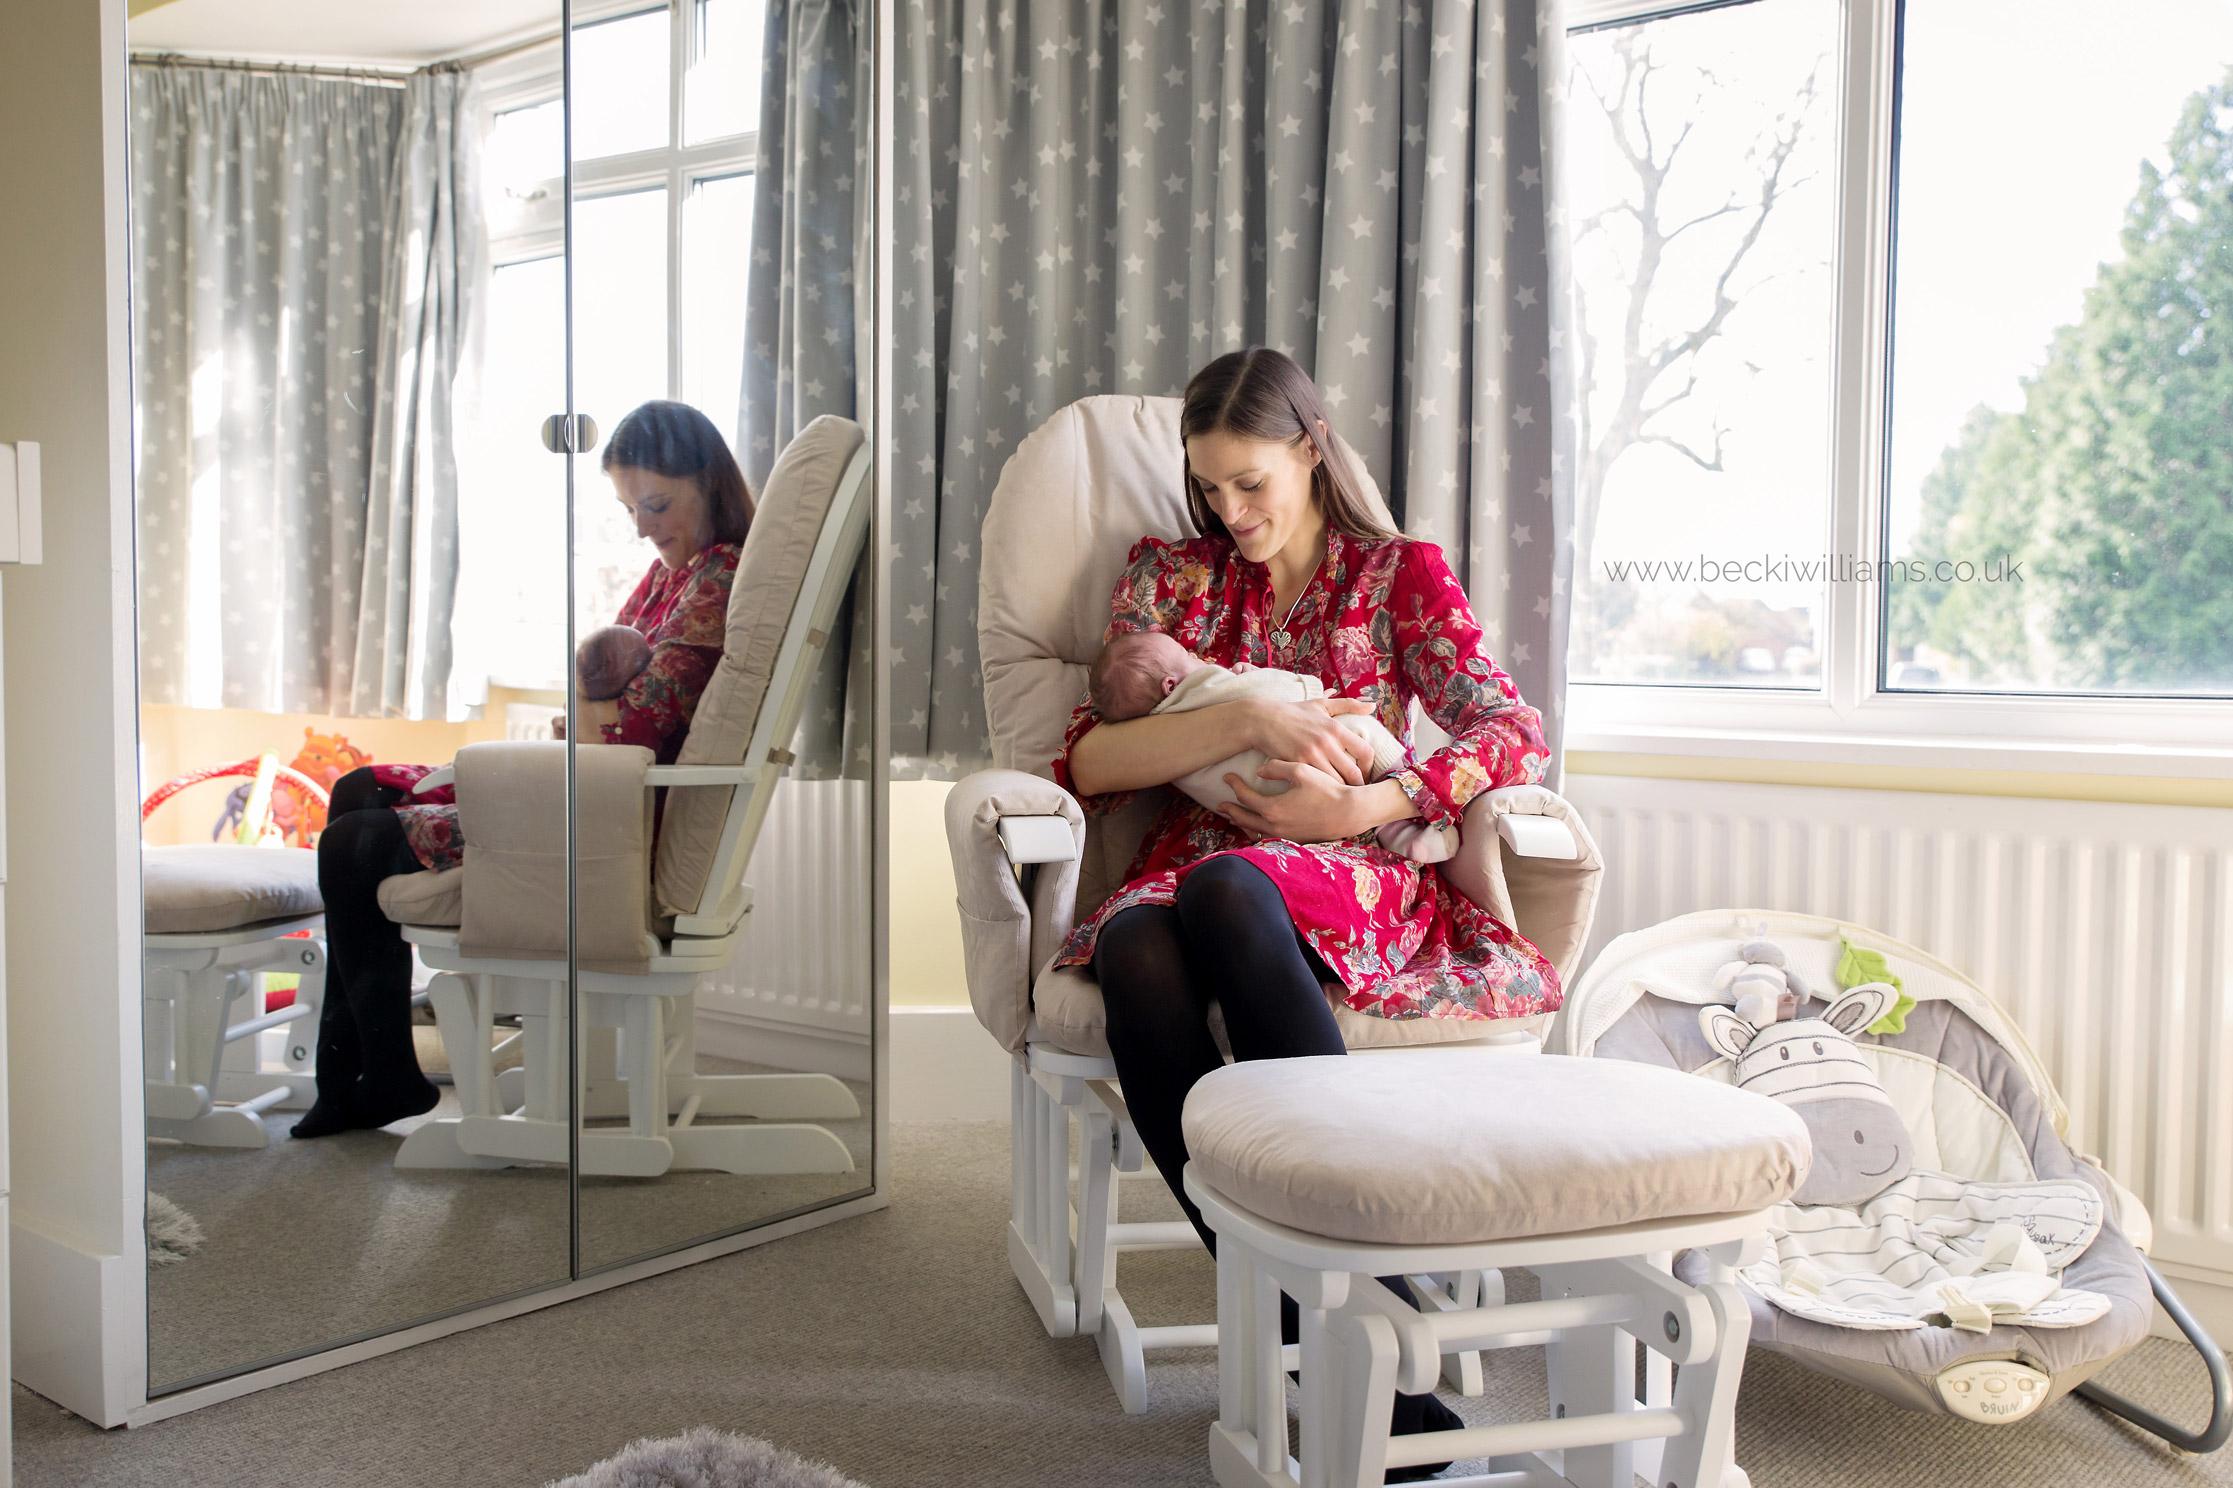 lifestyle-newborn-photography-hemel-hempstead-redbourn-at-home-new-mum-nursery-relaxed-lifestyle-photos.jpg